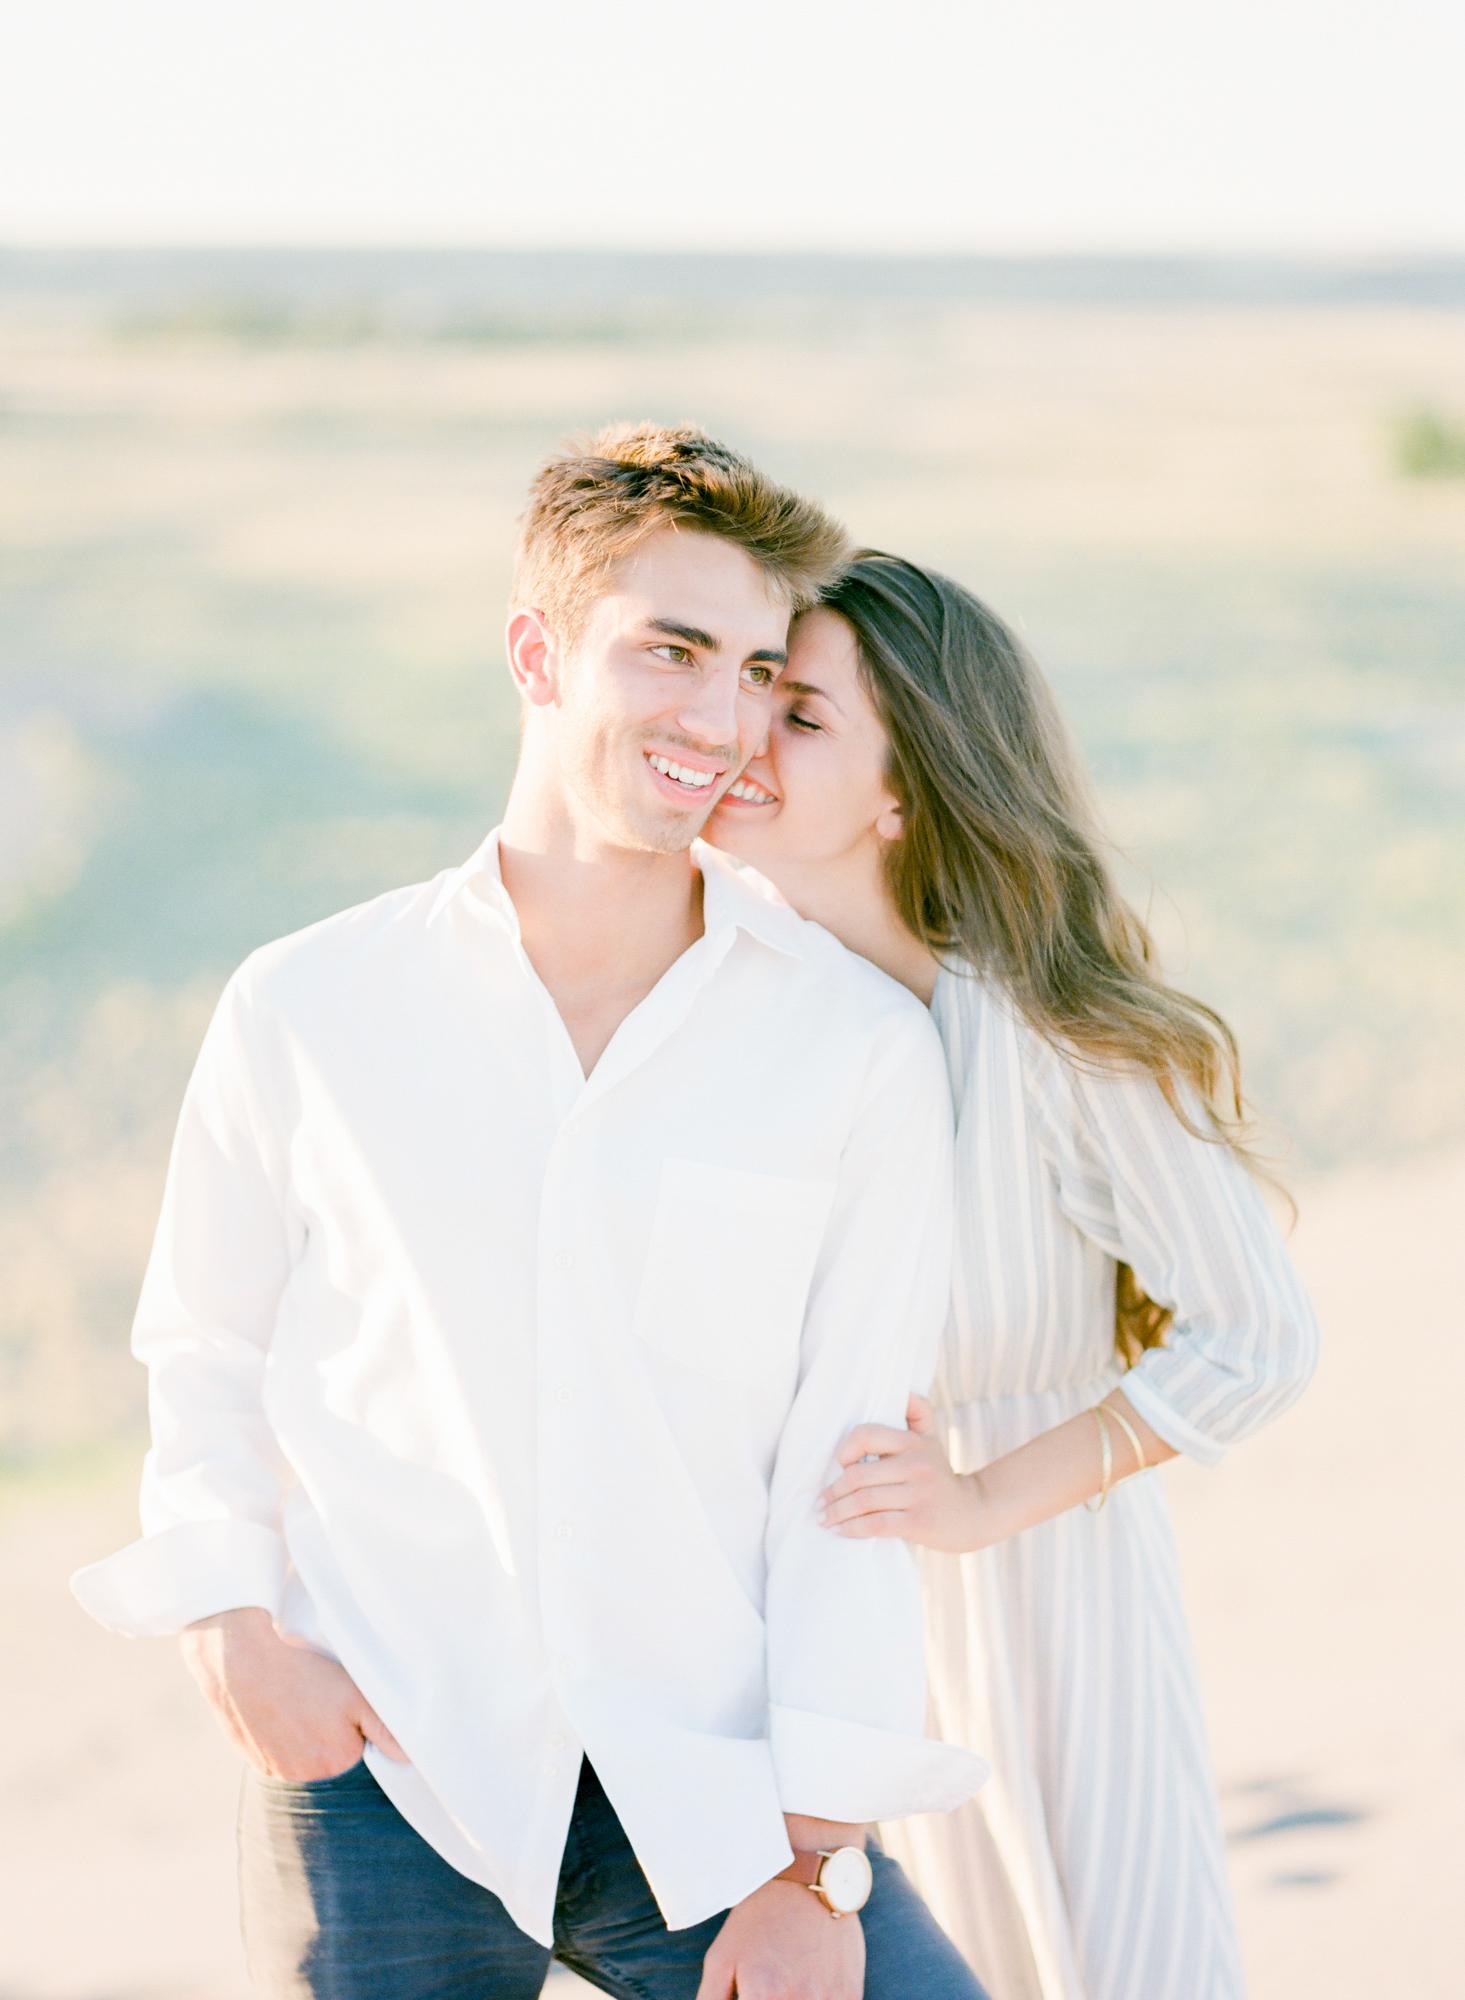 charlotte-charleston-wedding-family-film-destination-photographer-bruneau-sand-dunes-boise-idaho-2.jpg